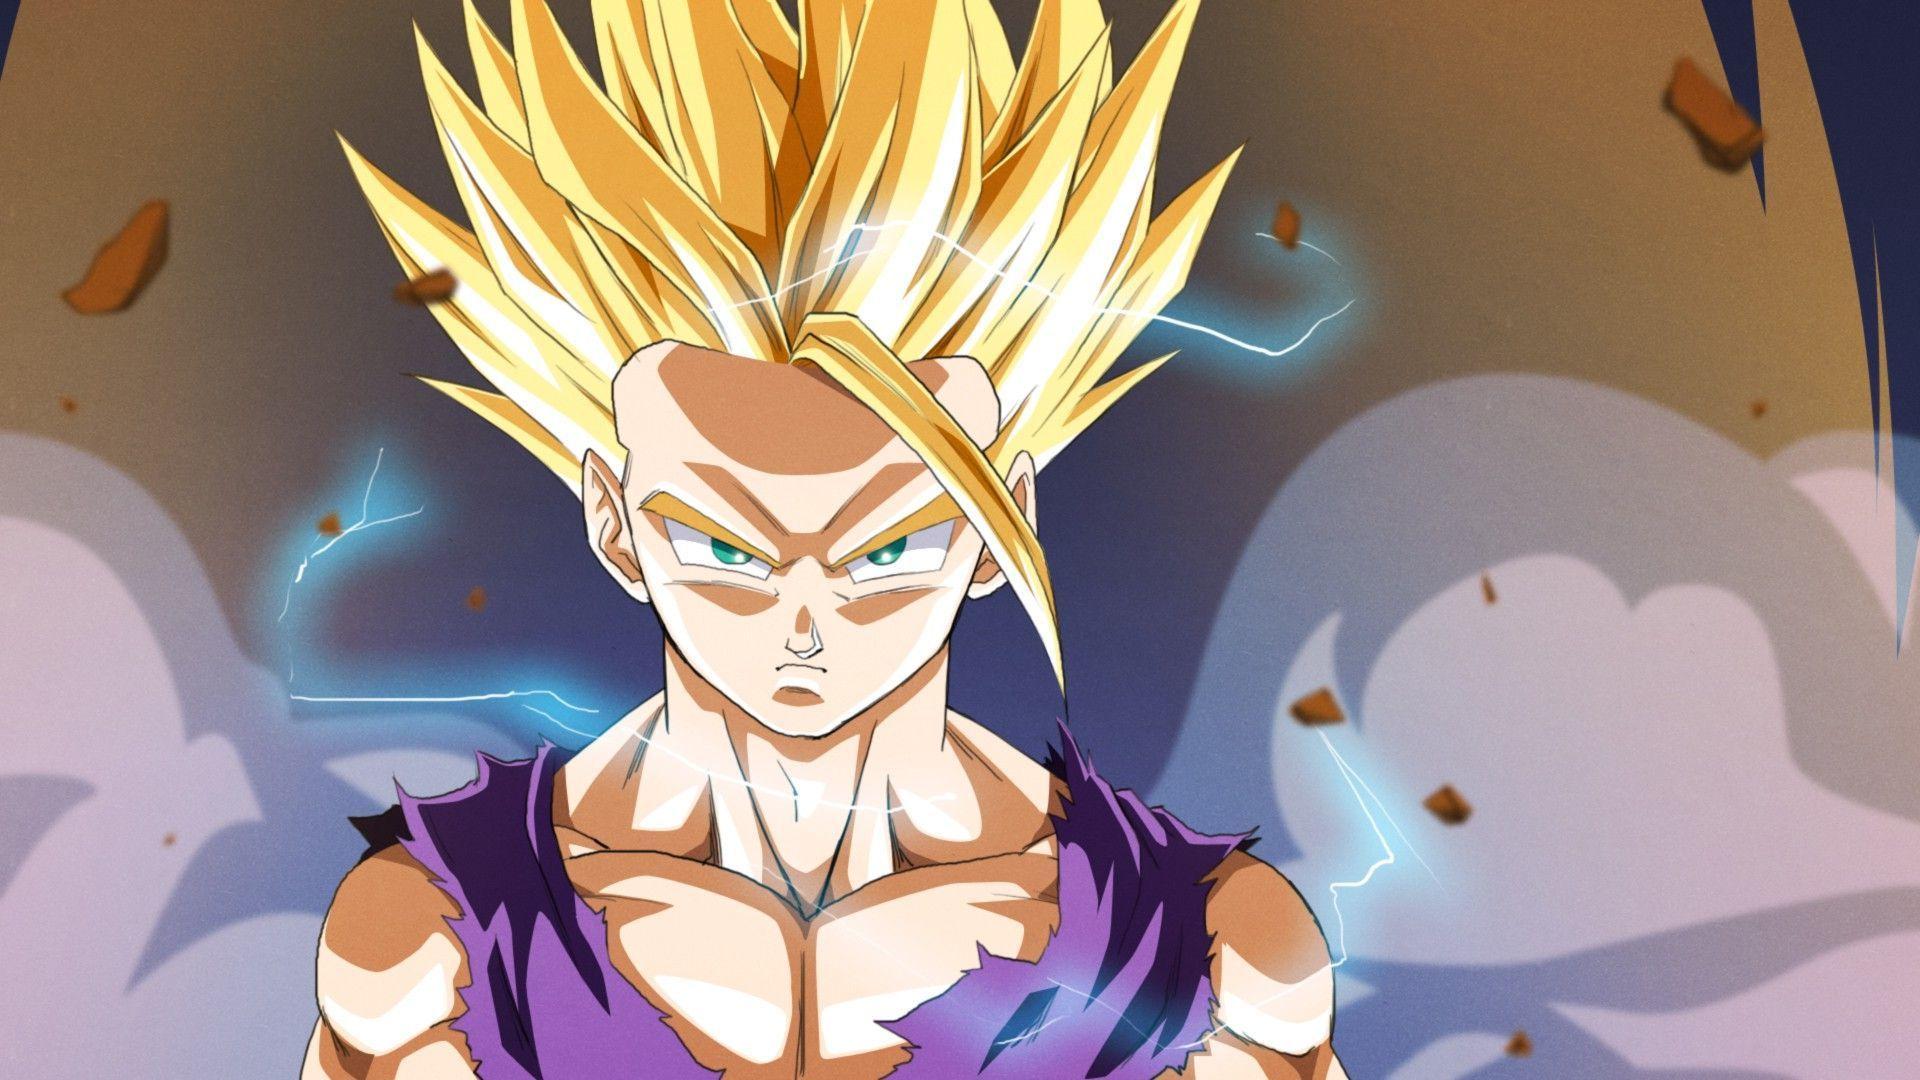 Super Saiyan Goku Anime Hd Wallpaper 1920x1080 5455